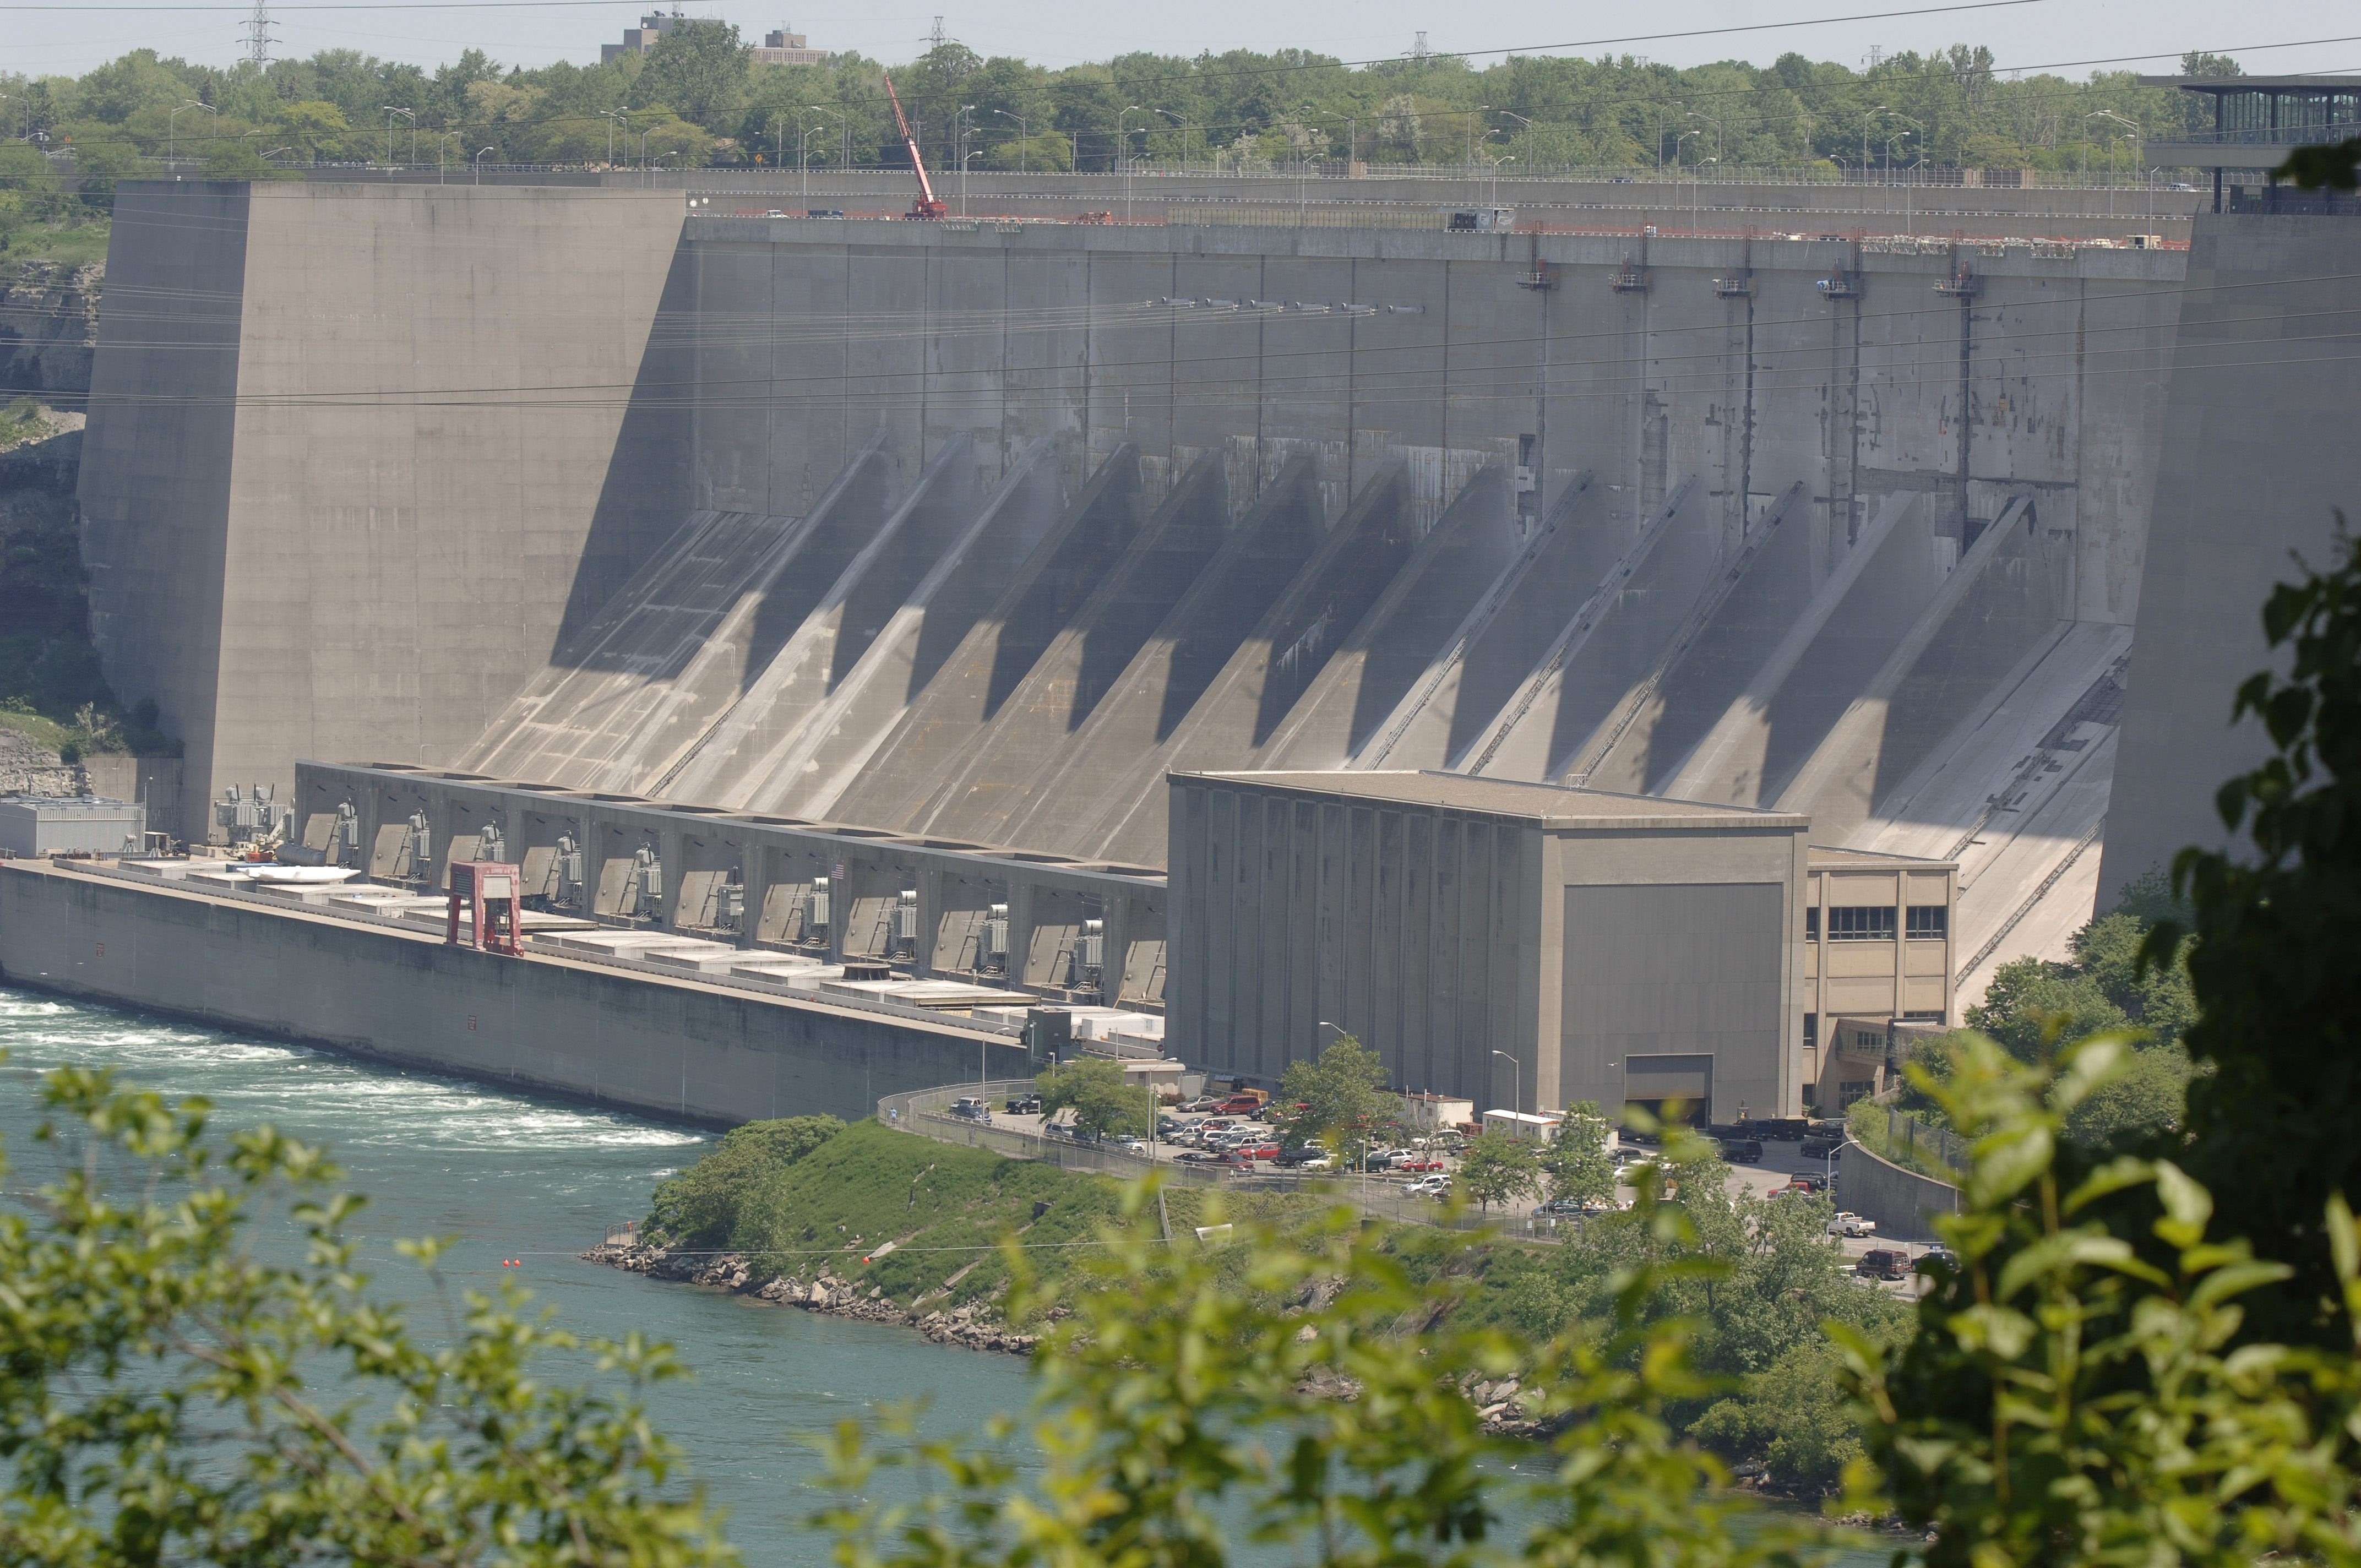 The New York State Power Authority Niagara Power Project on the lower Niagara River. (Derek Gee/Buffalo News file photo)